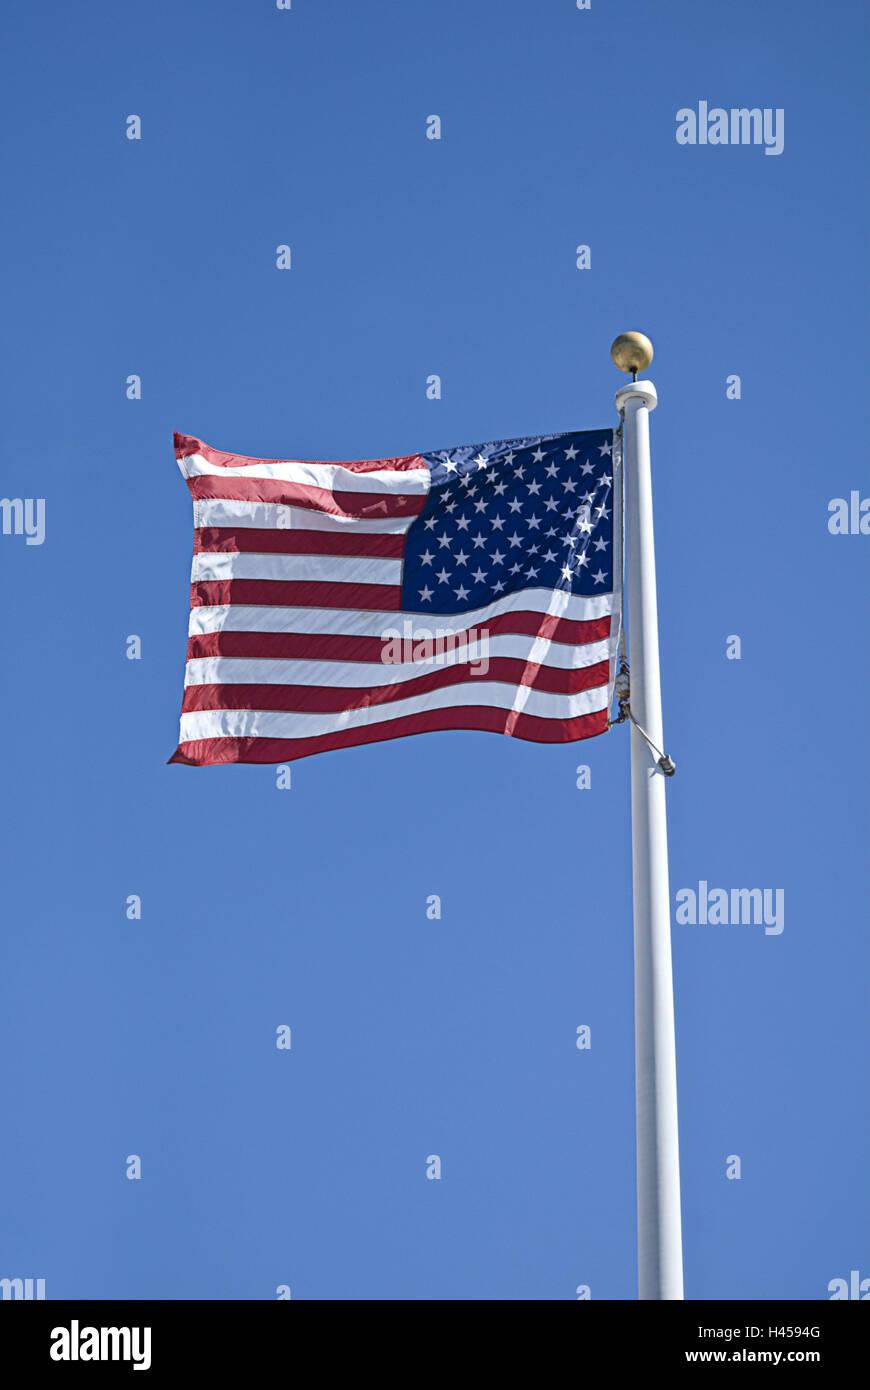 The USA, national flag, blow, - Stock Image